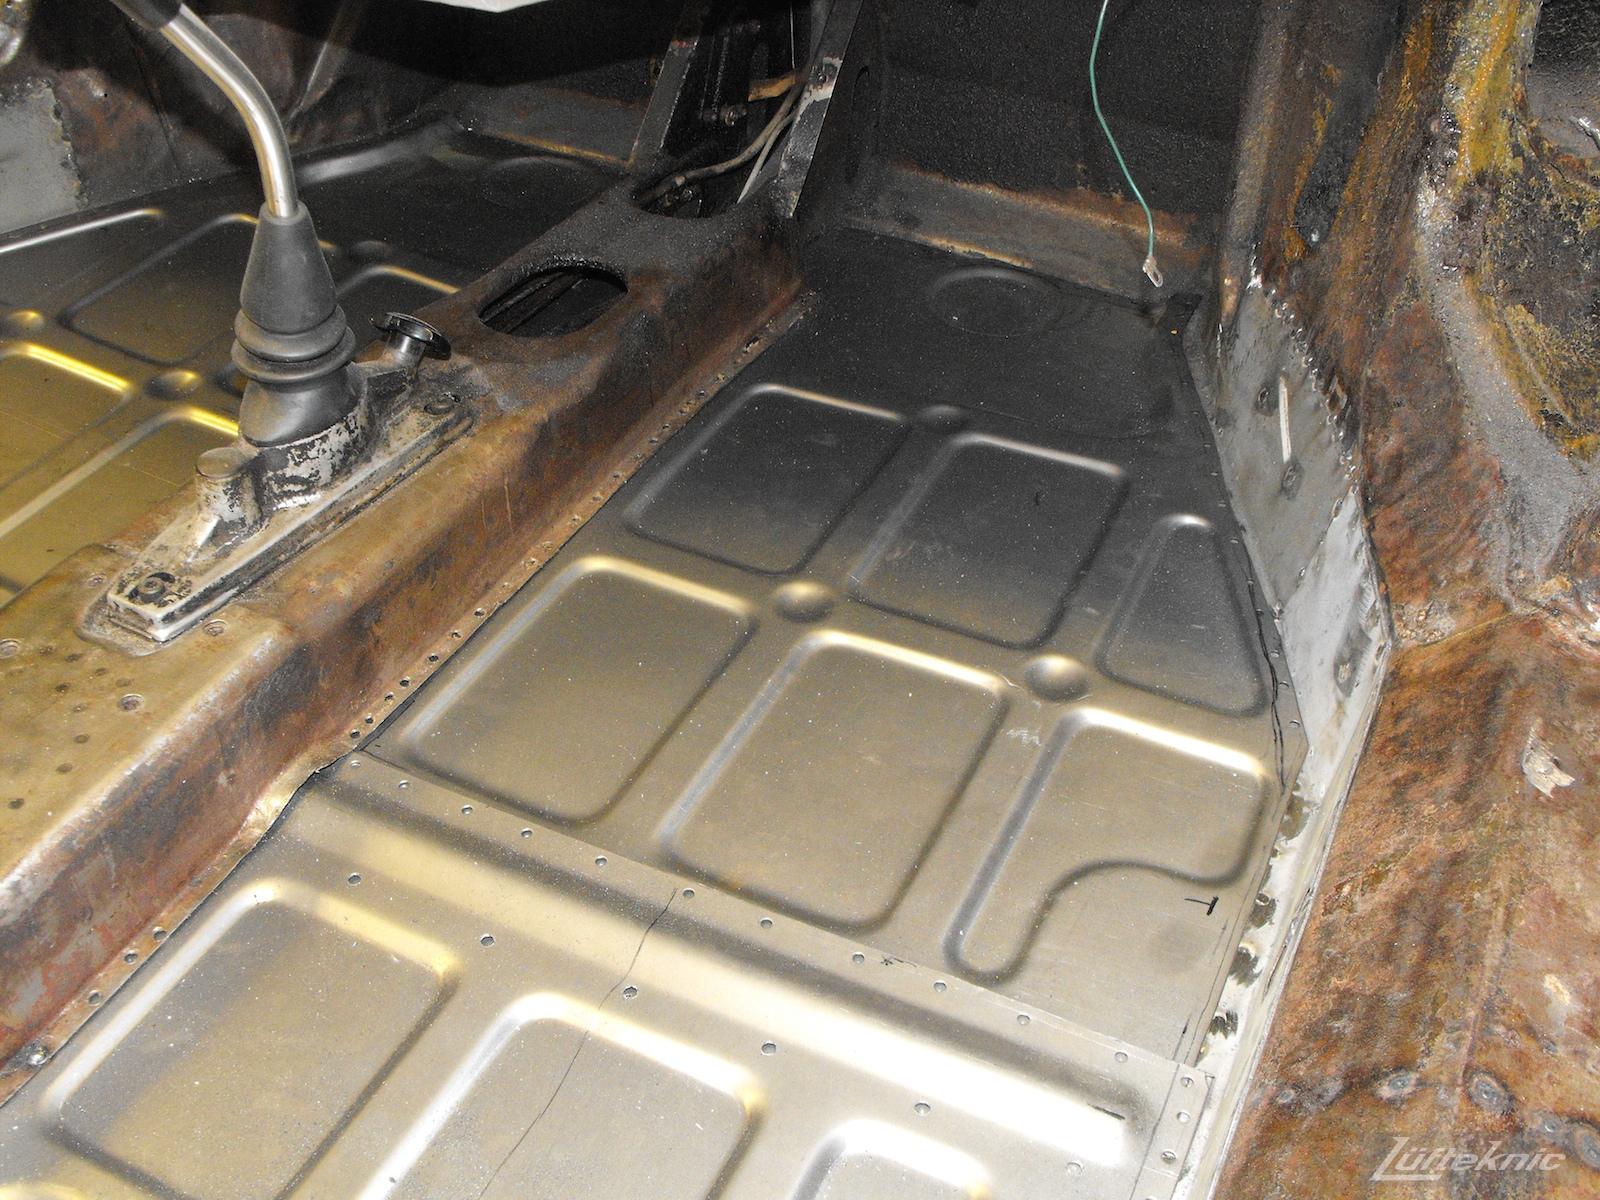 New floors being installed into a 1961 Porsche 356B Roadster restoration.